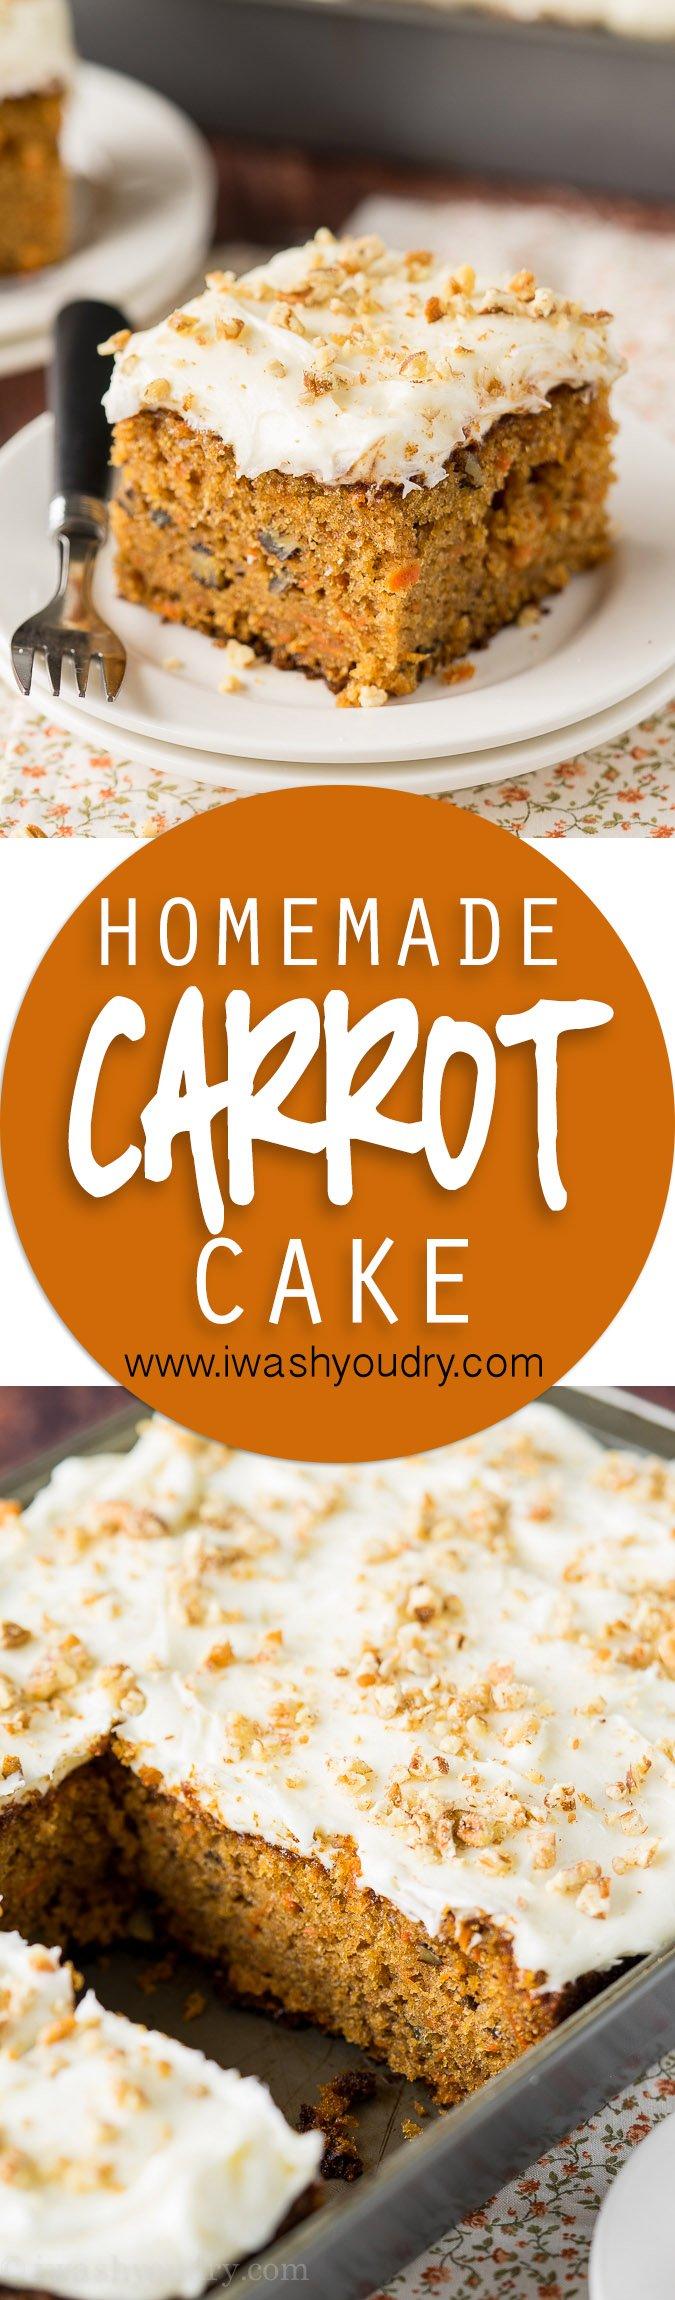 Homemade Carrot Cake With Pineapple